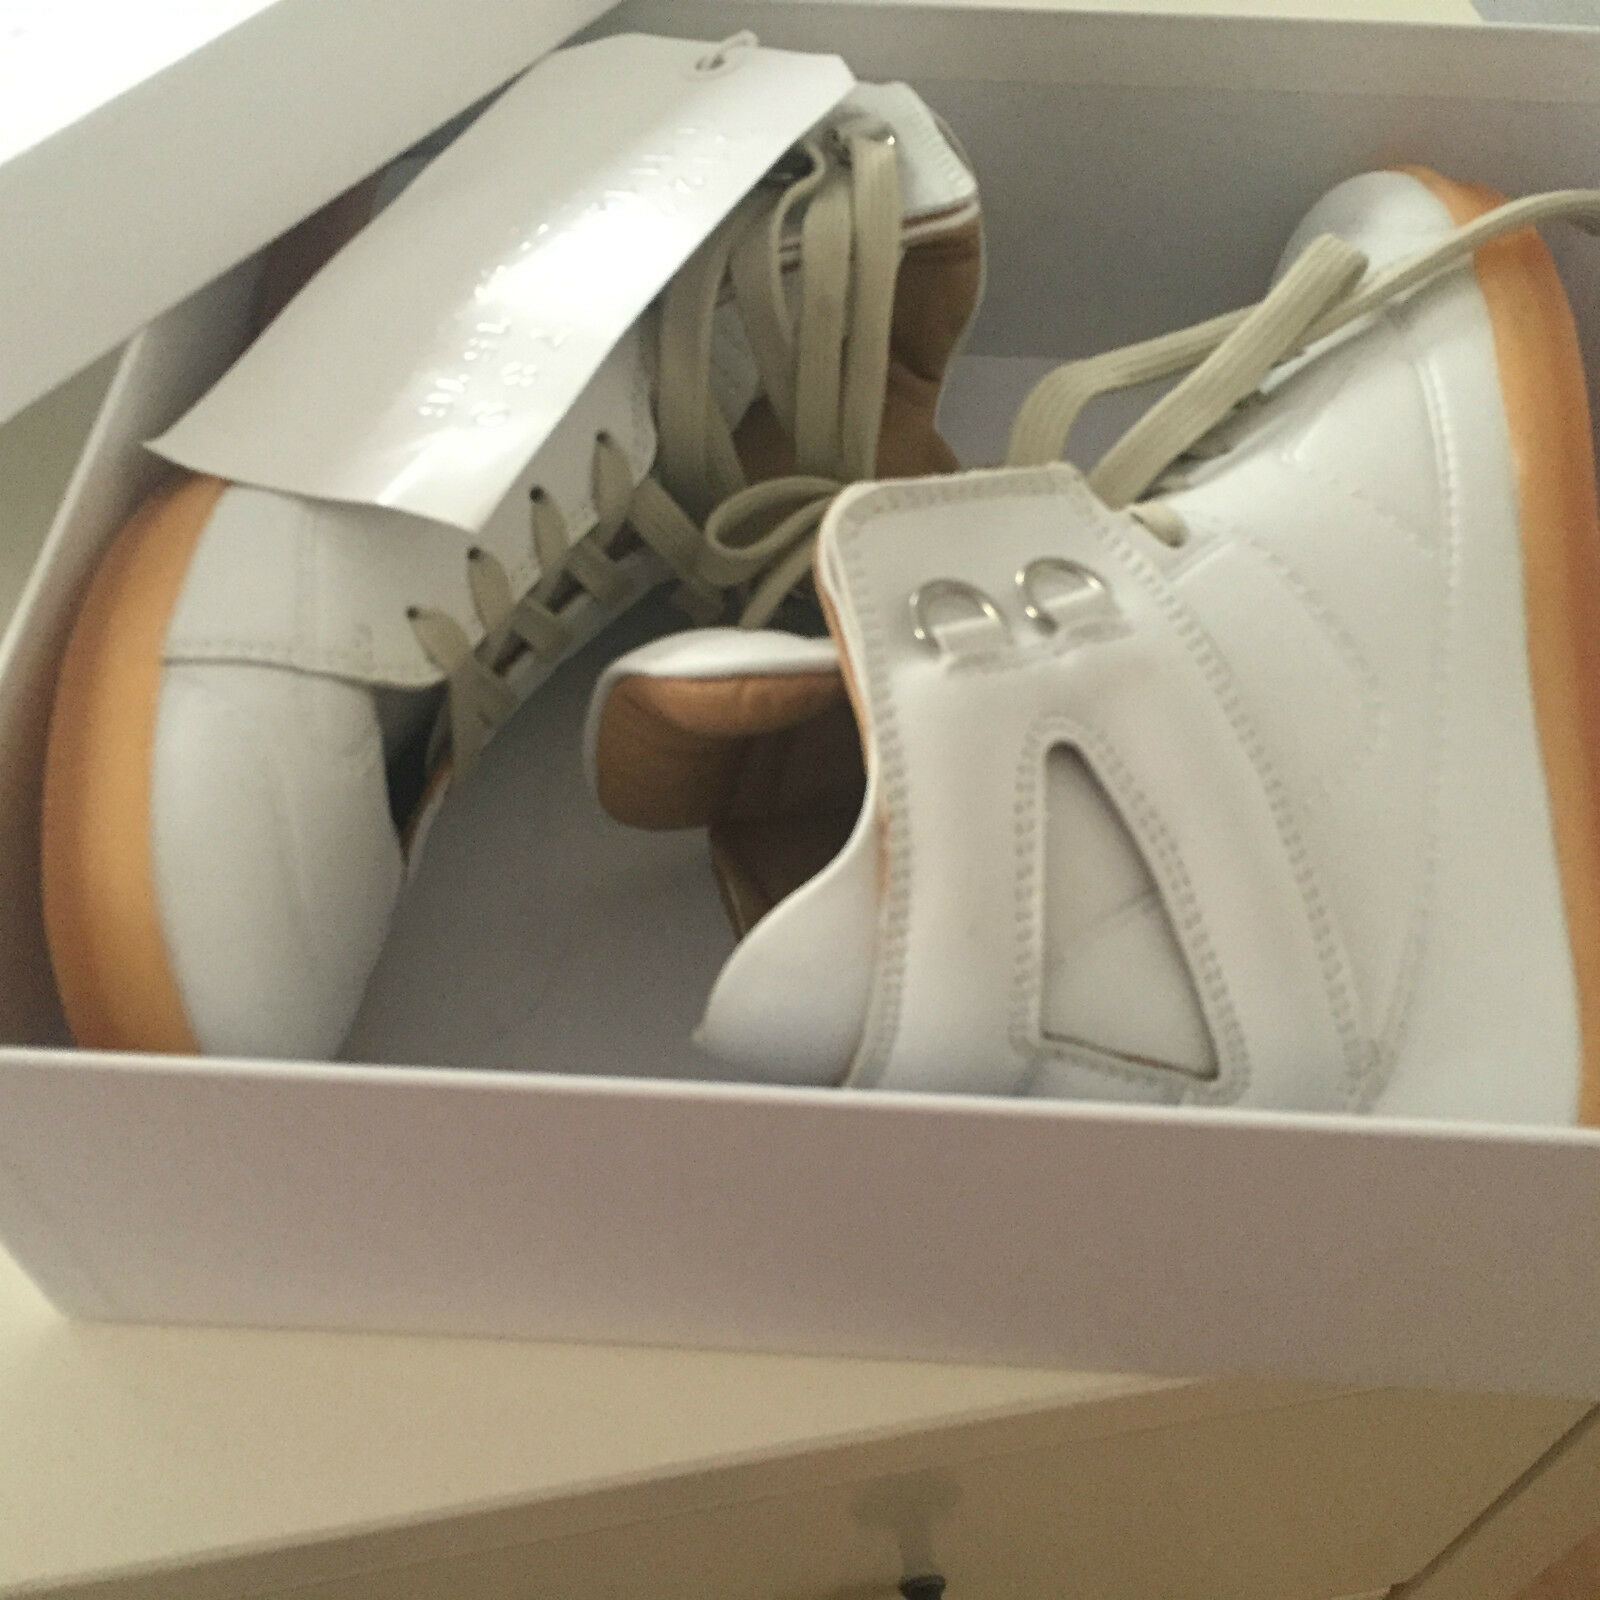 Maison Martin Margiela Paris H&M High Leder Top Sneakers Weiß White Leder High 40 US 7 77016b